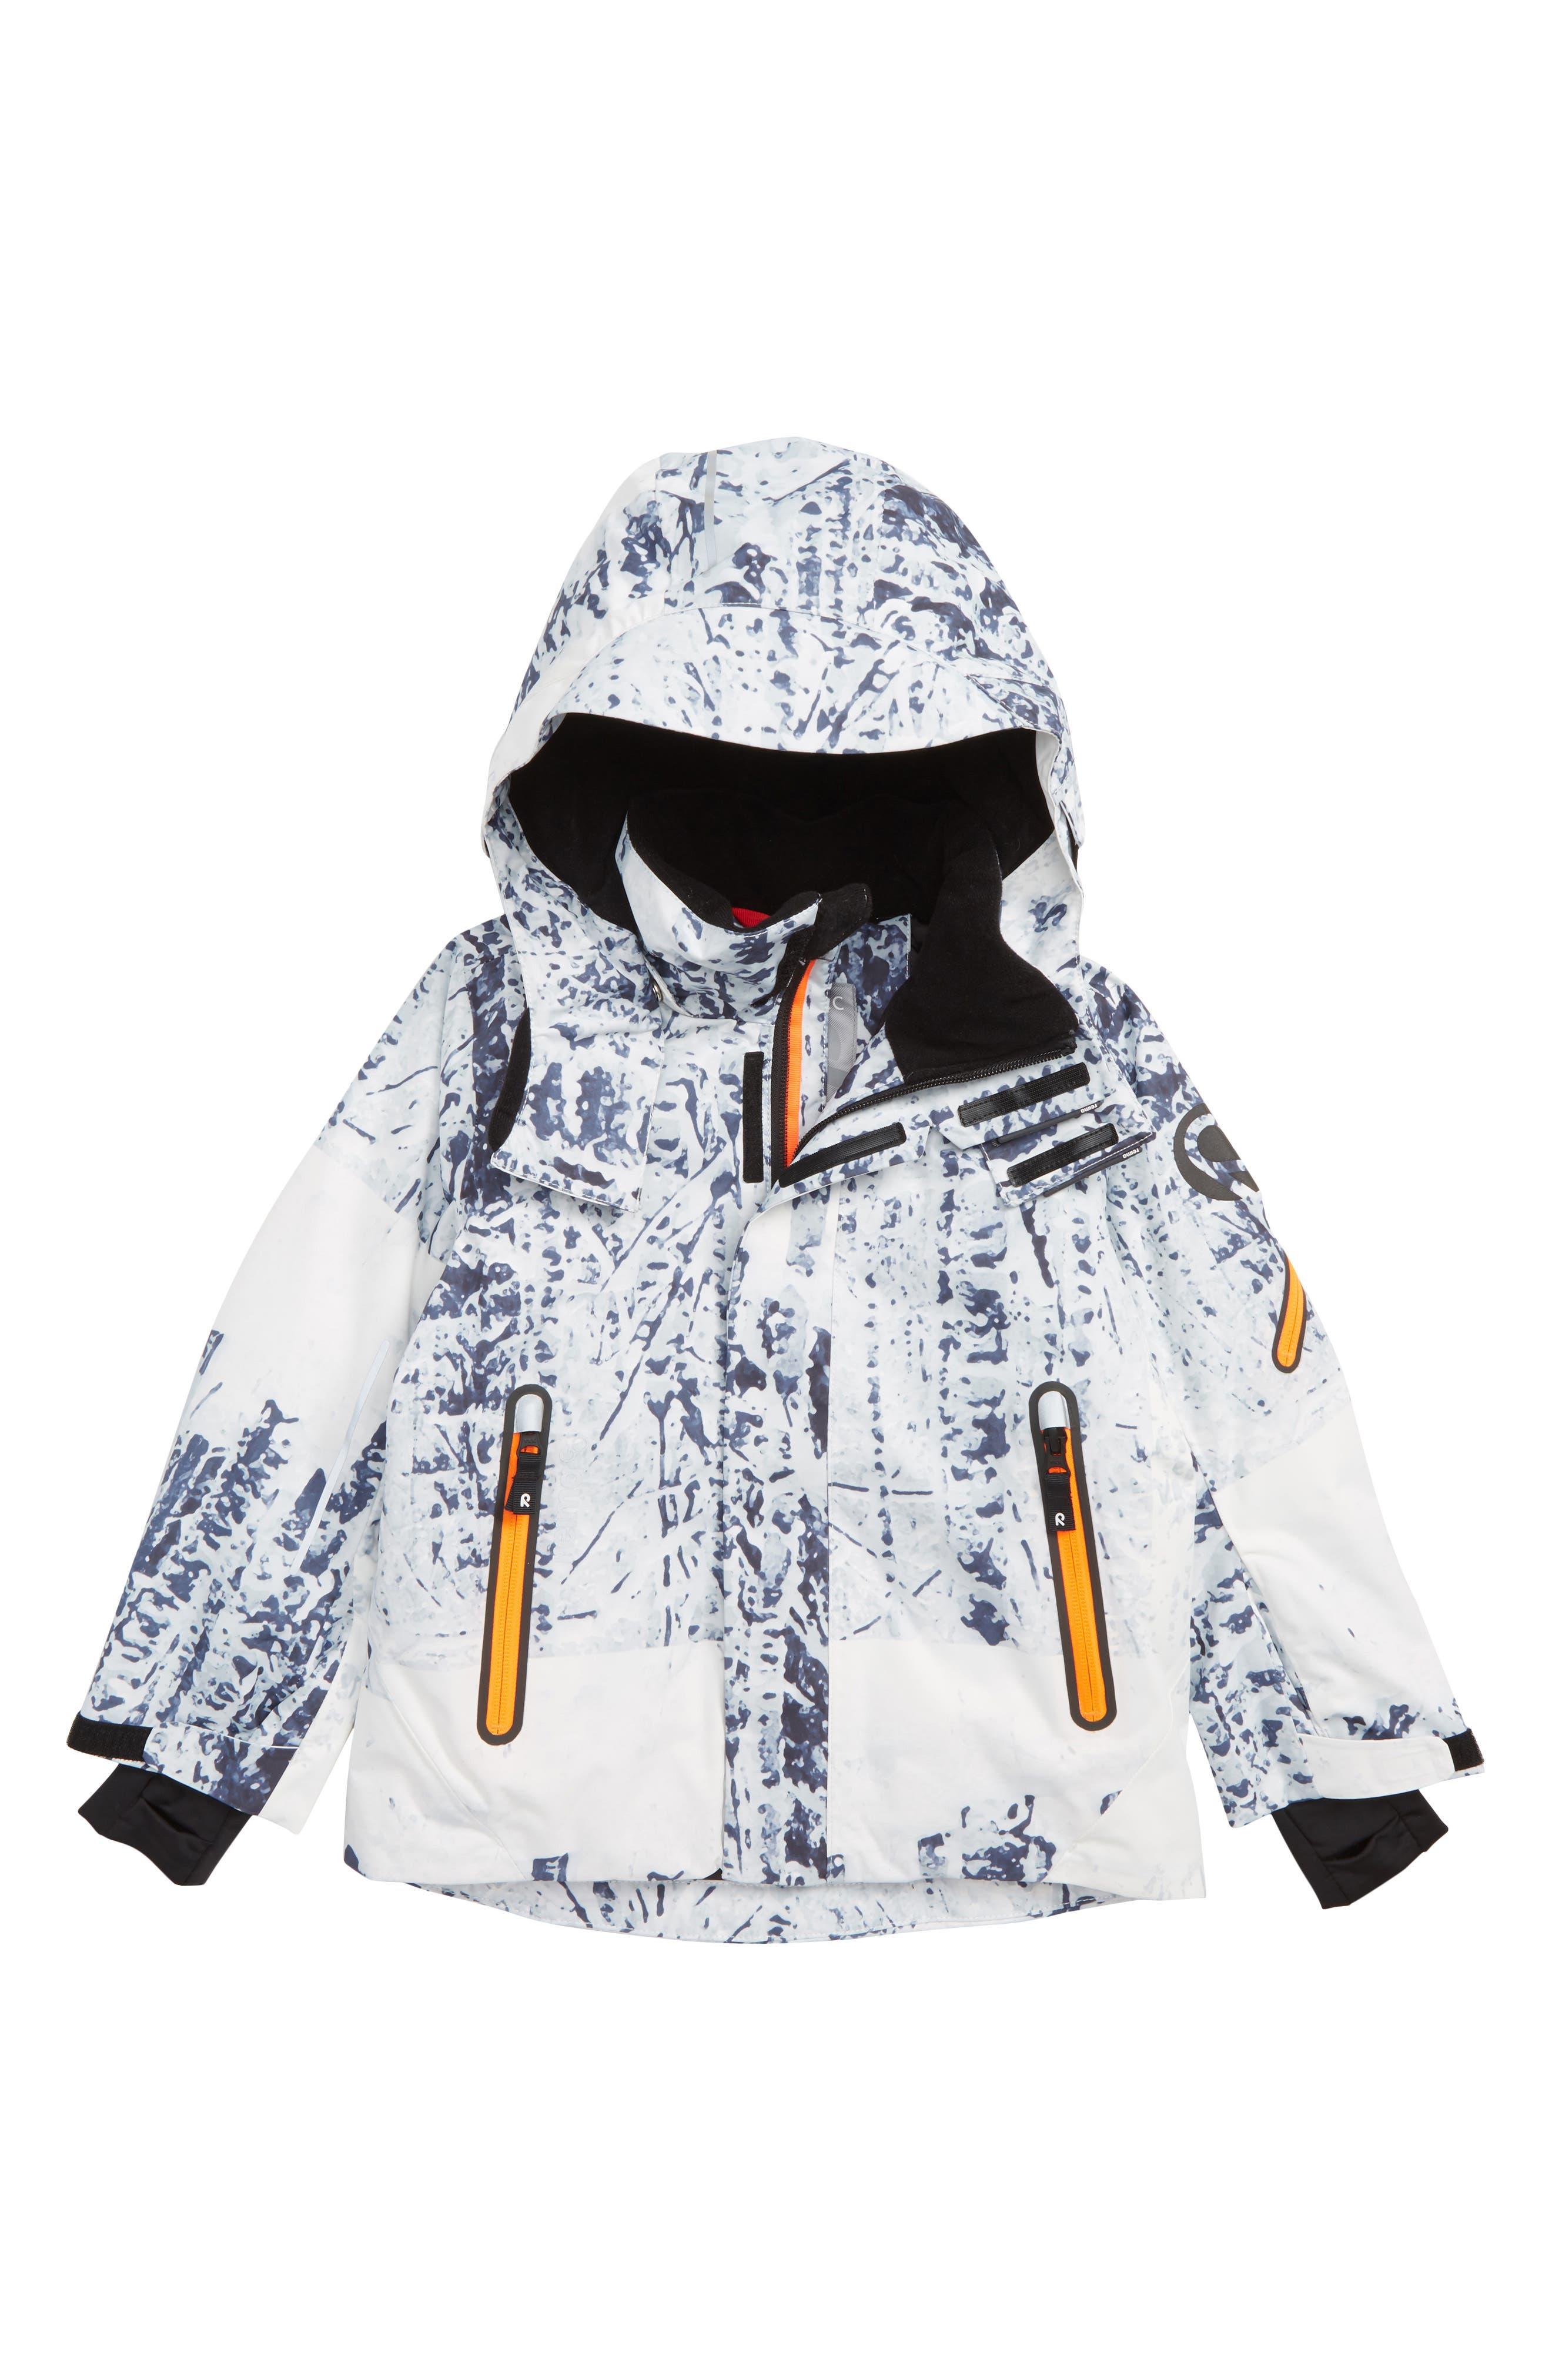 Reimatec<sup>®</sup> Wheeler Waterproof Hooded Jacket,                         Main,                         color, WHITE PRINT